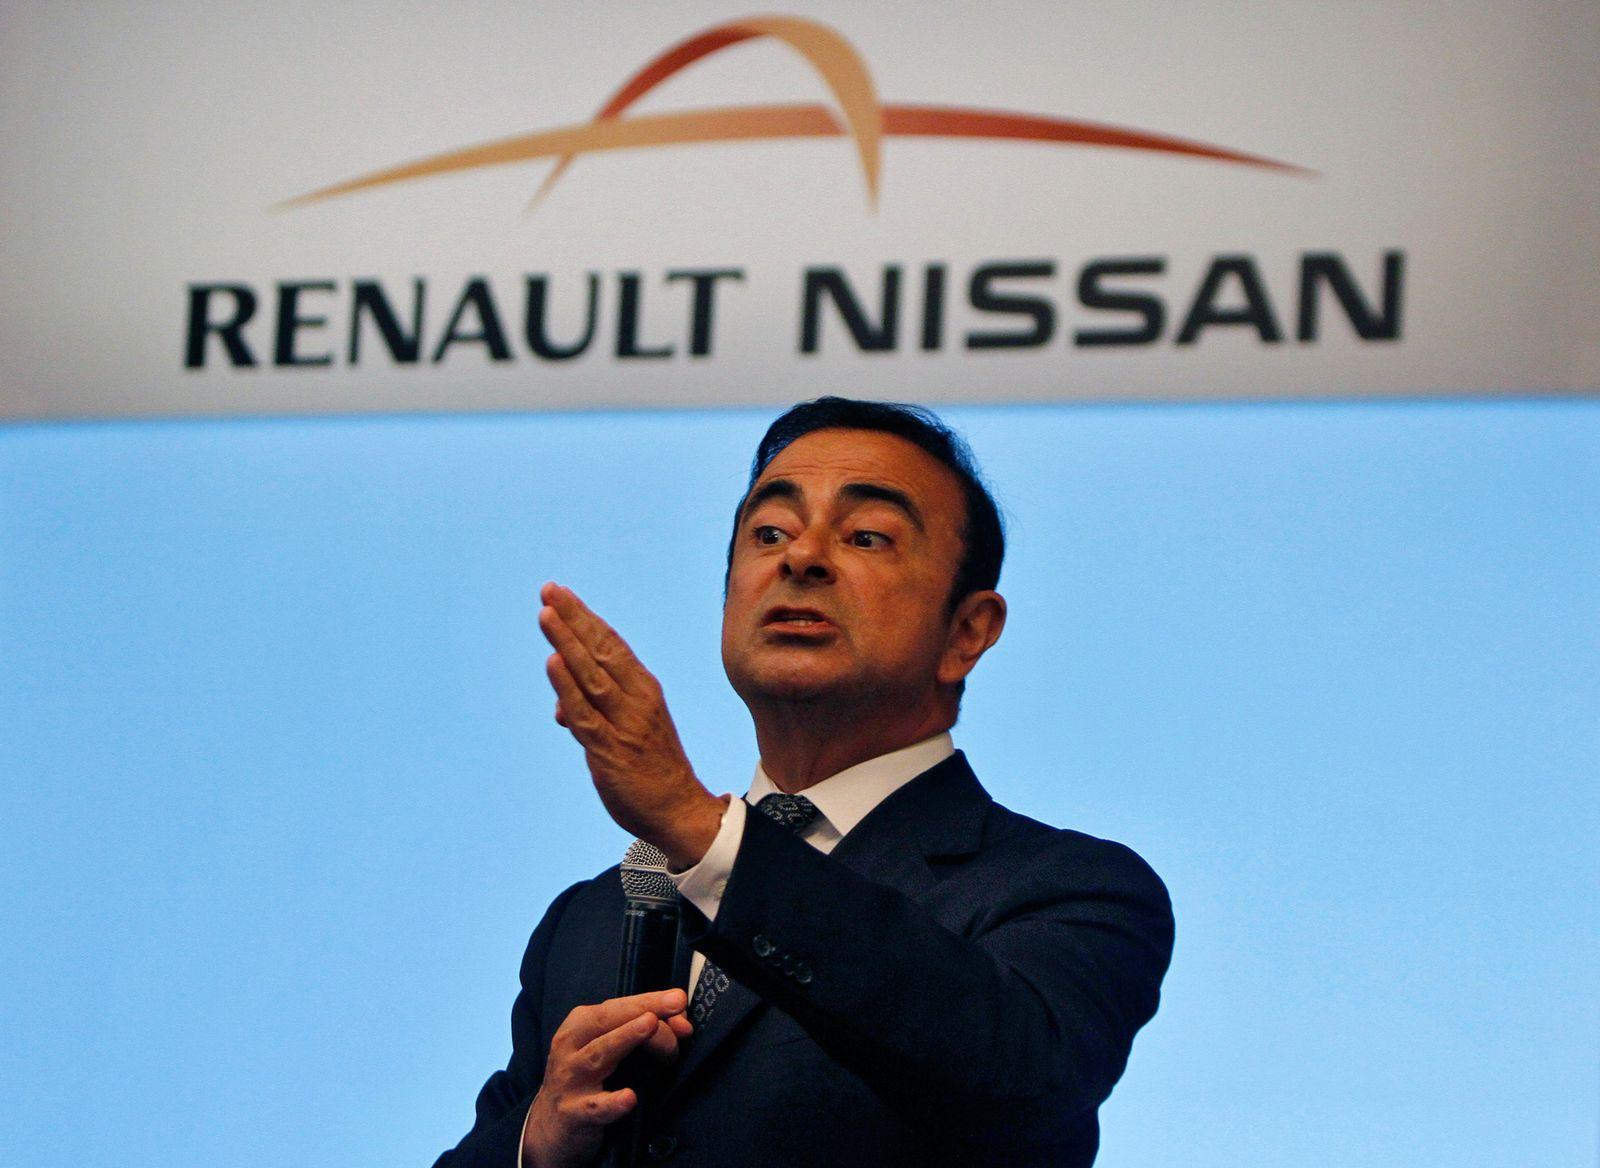 Carlos Ghosn / Nissan